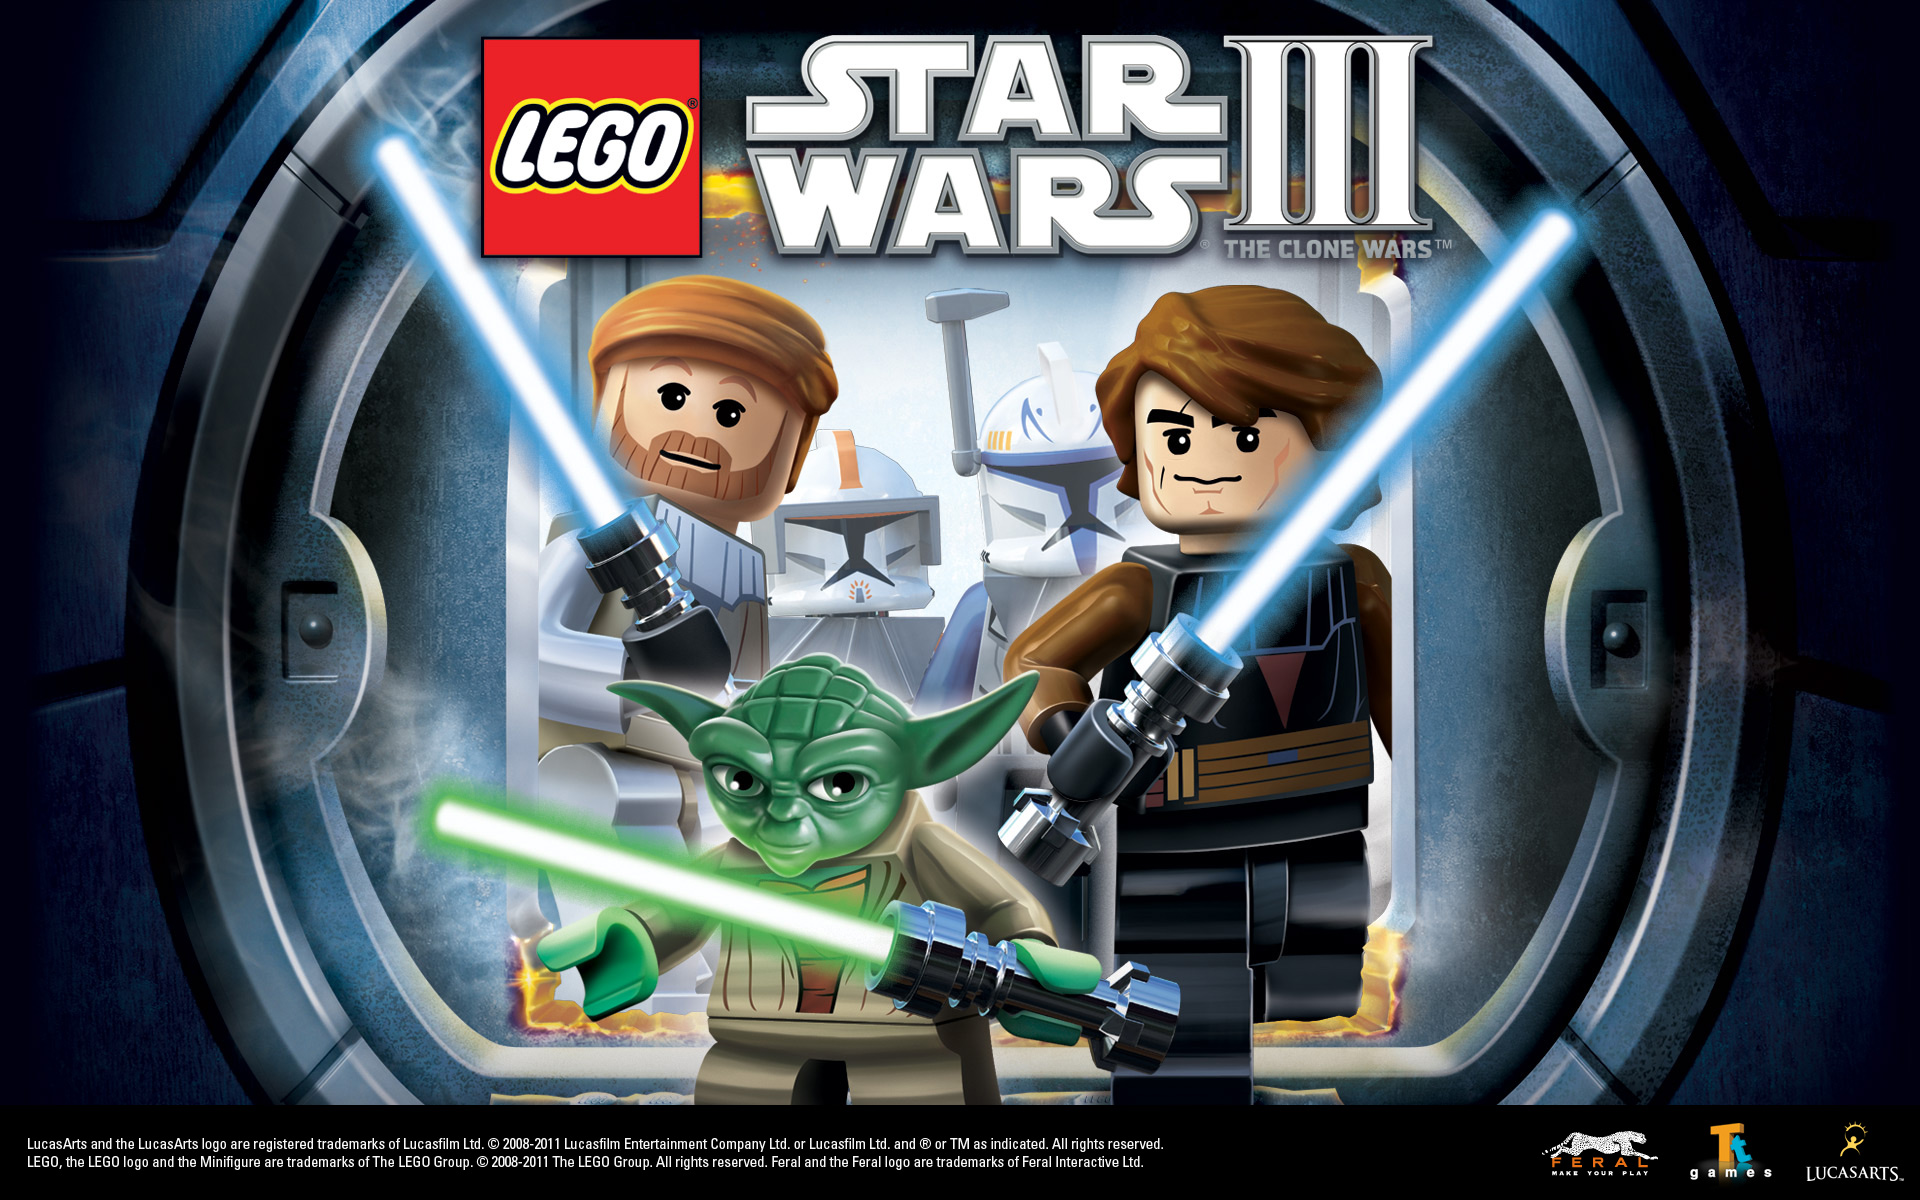 Lego star wars iii the clone wars vehicle info - 1920 X 1200